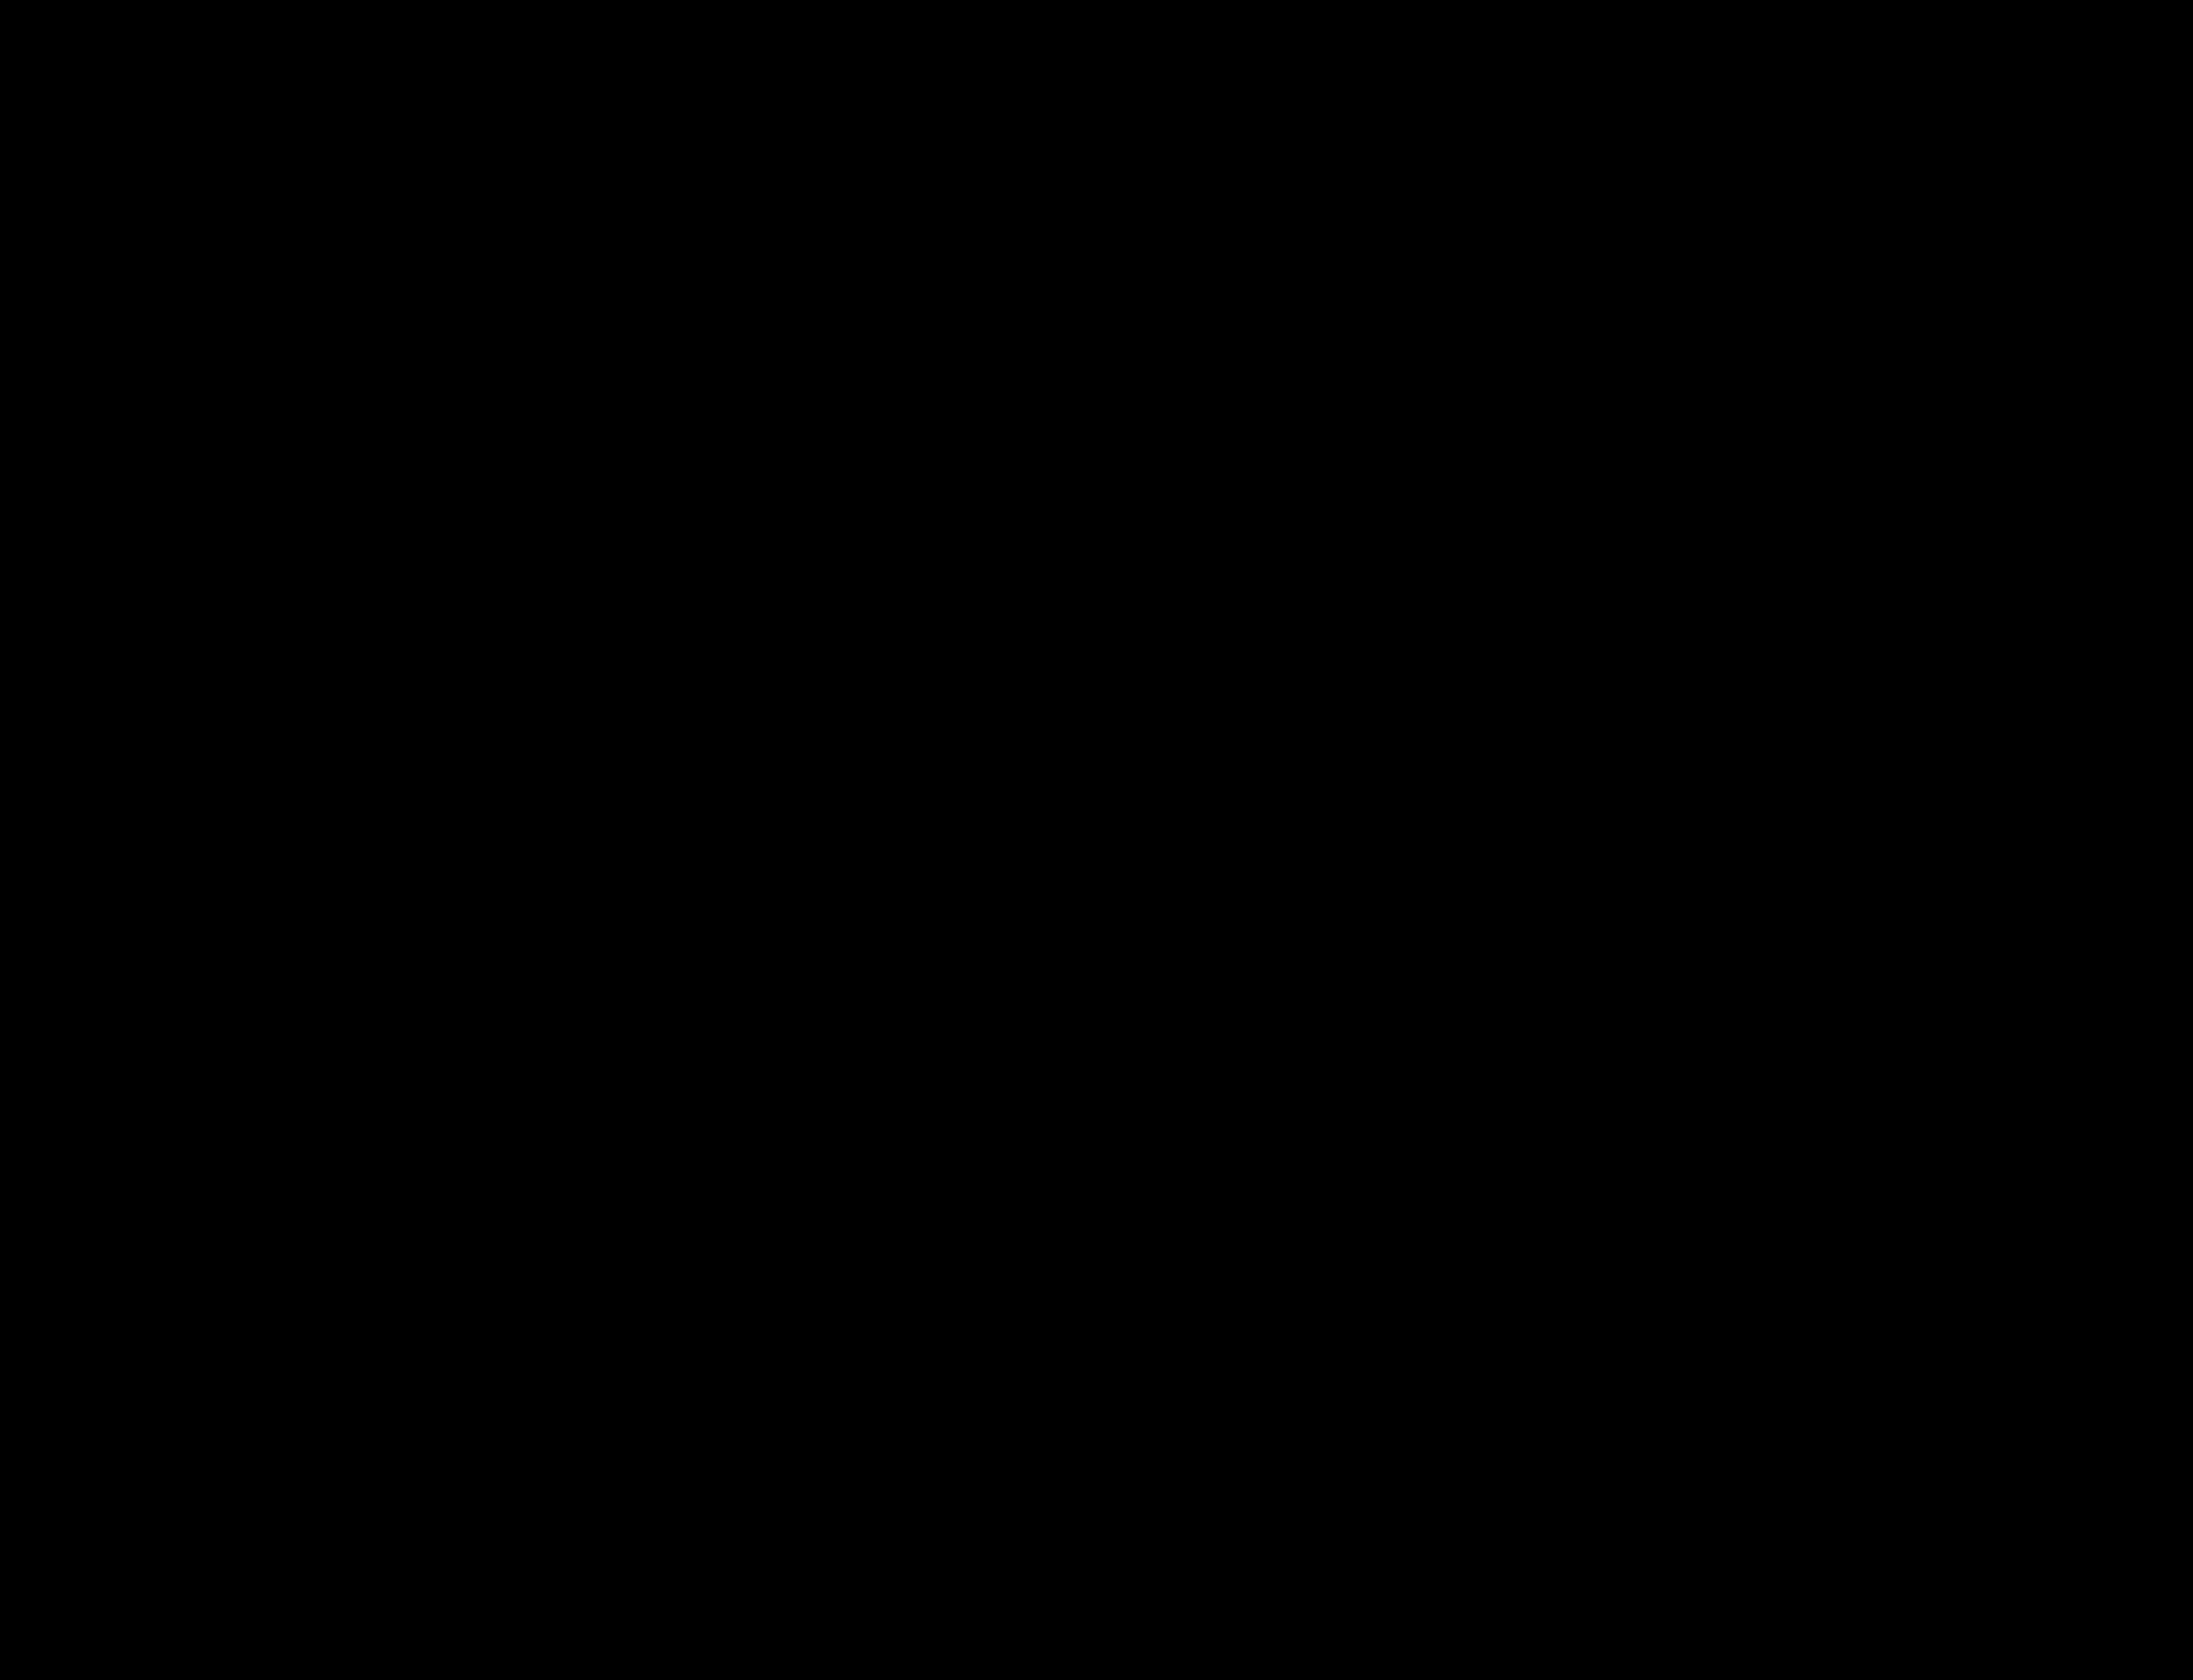 2350x1800 Clipart